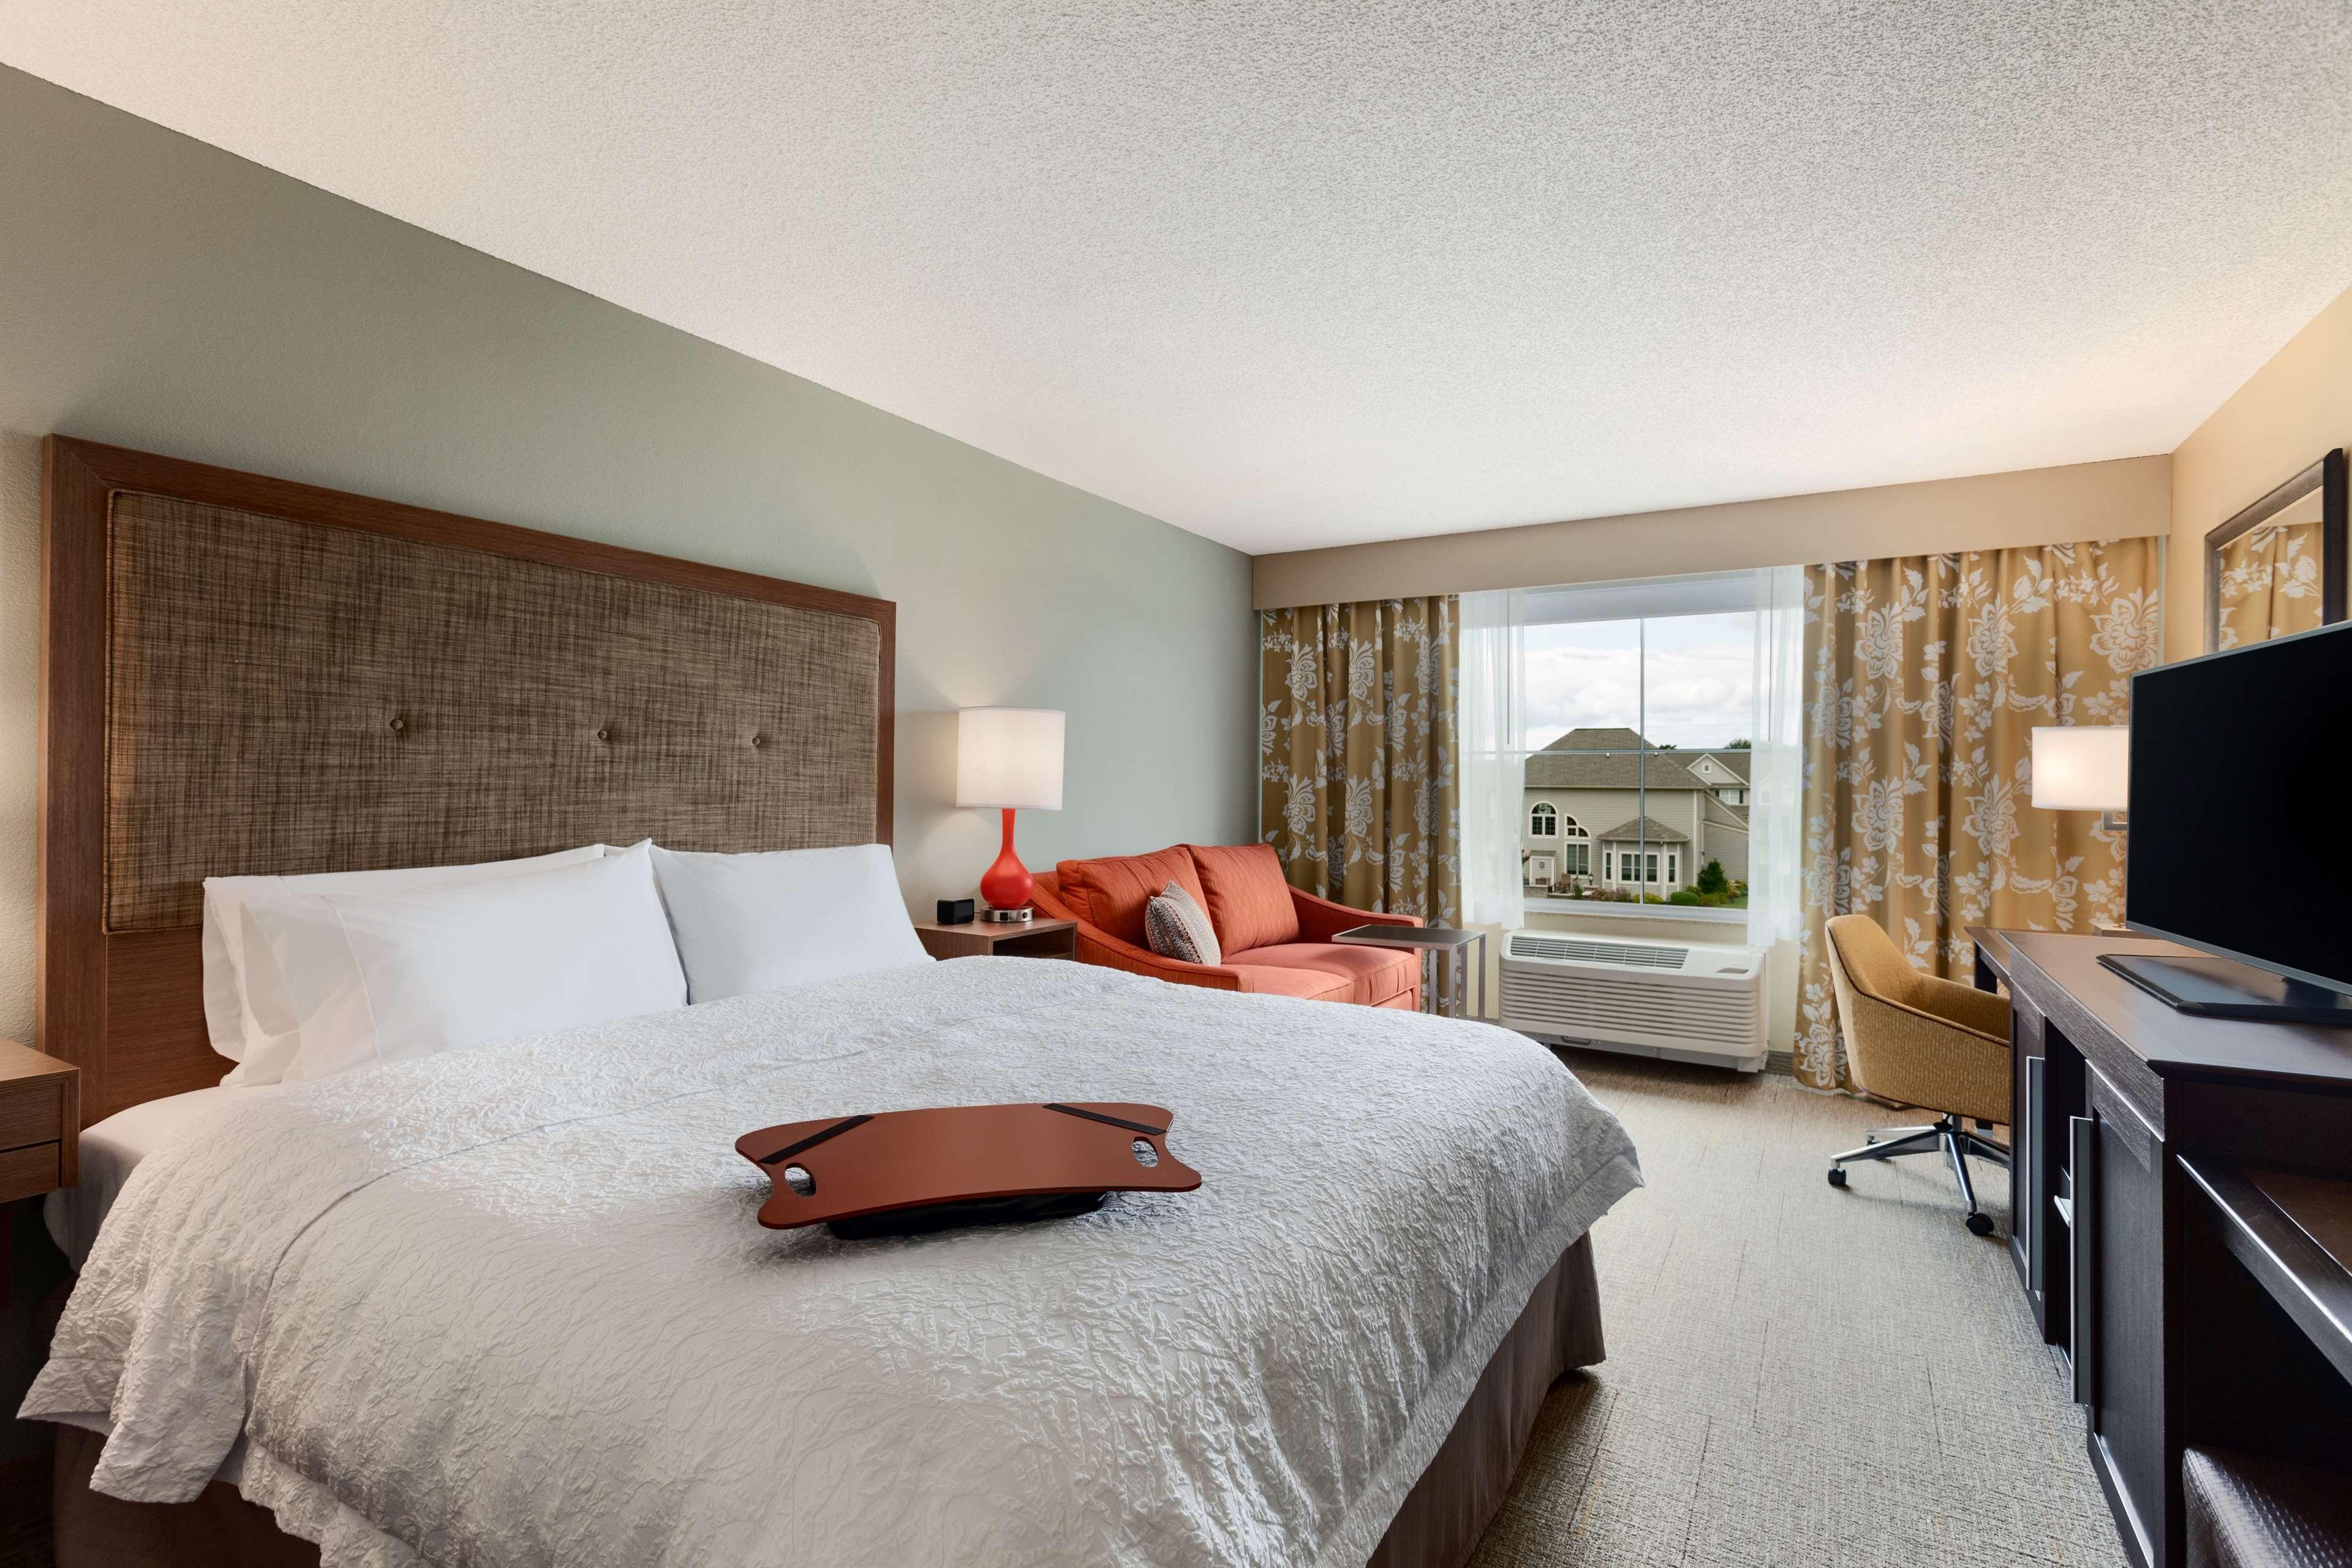 Hampton Inn & Suites Hershey Near The Park image 14